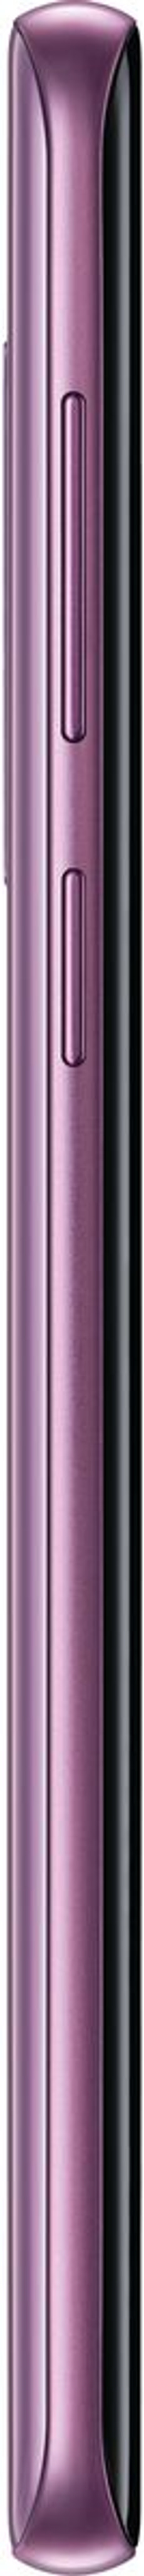 Galaxy S9+ Dual SIM 64GB Lilac Purple